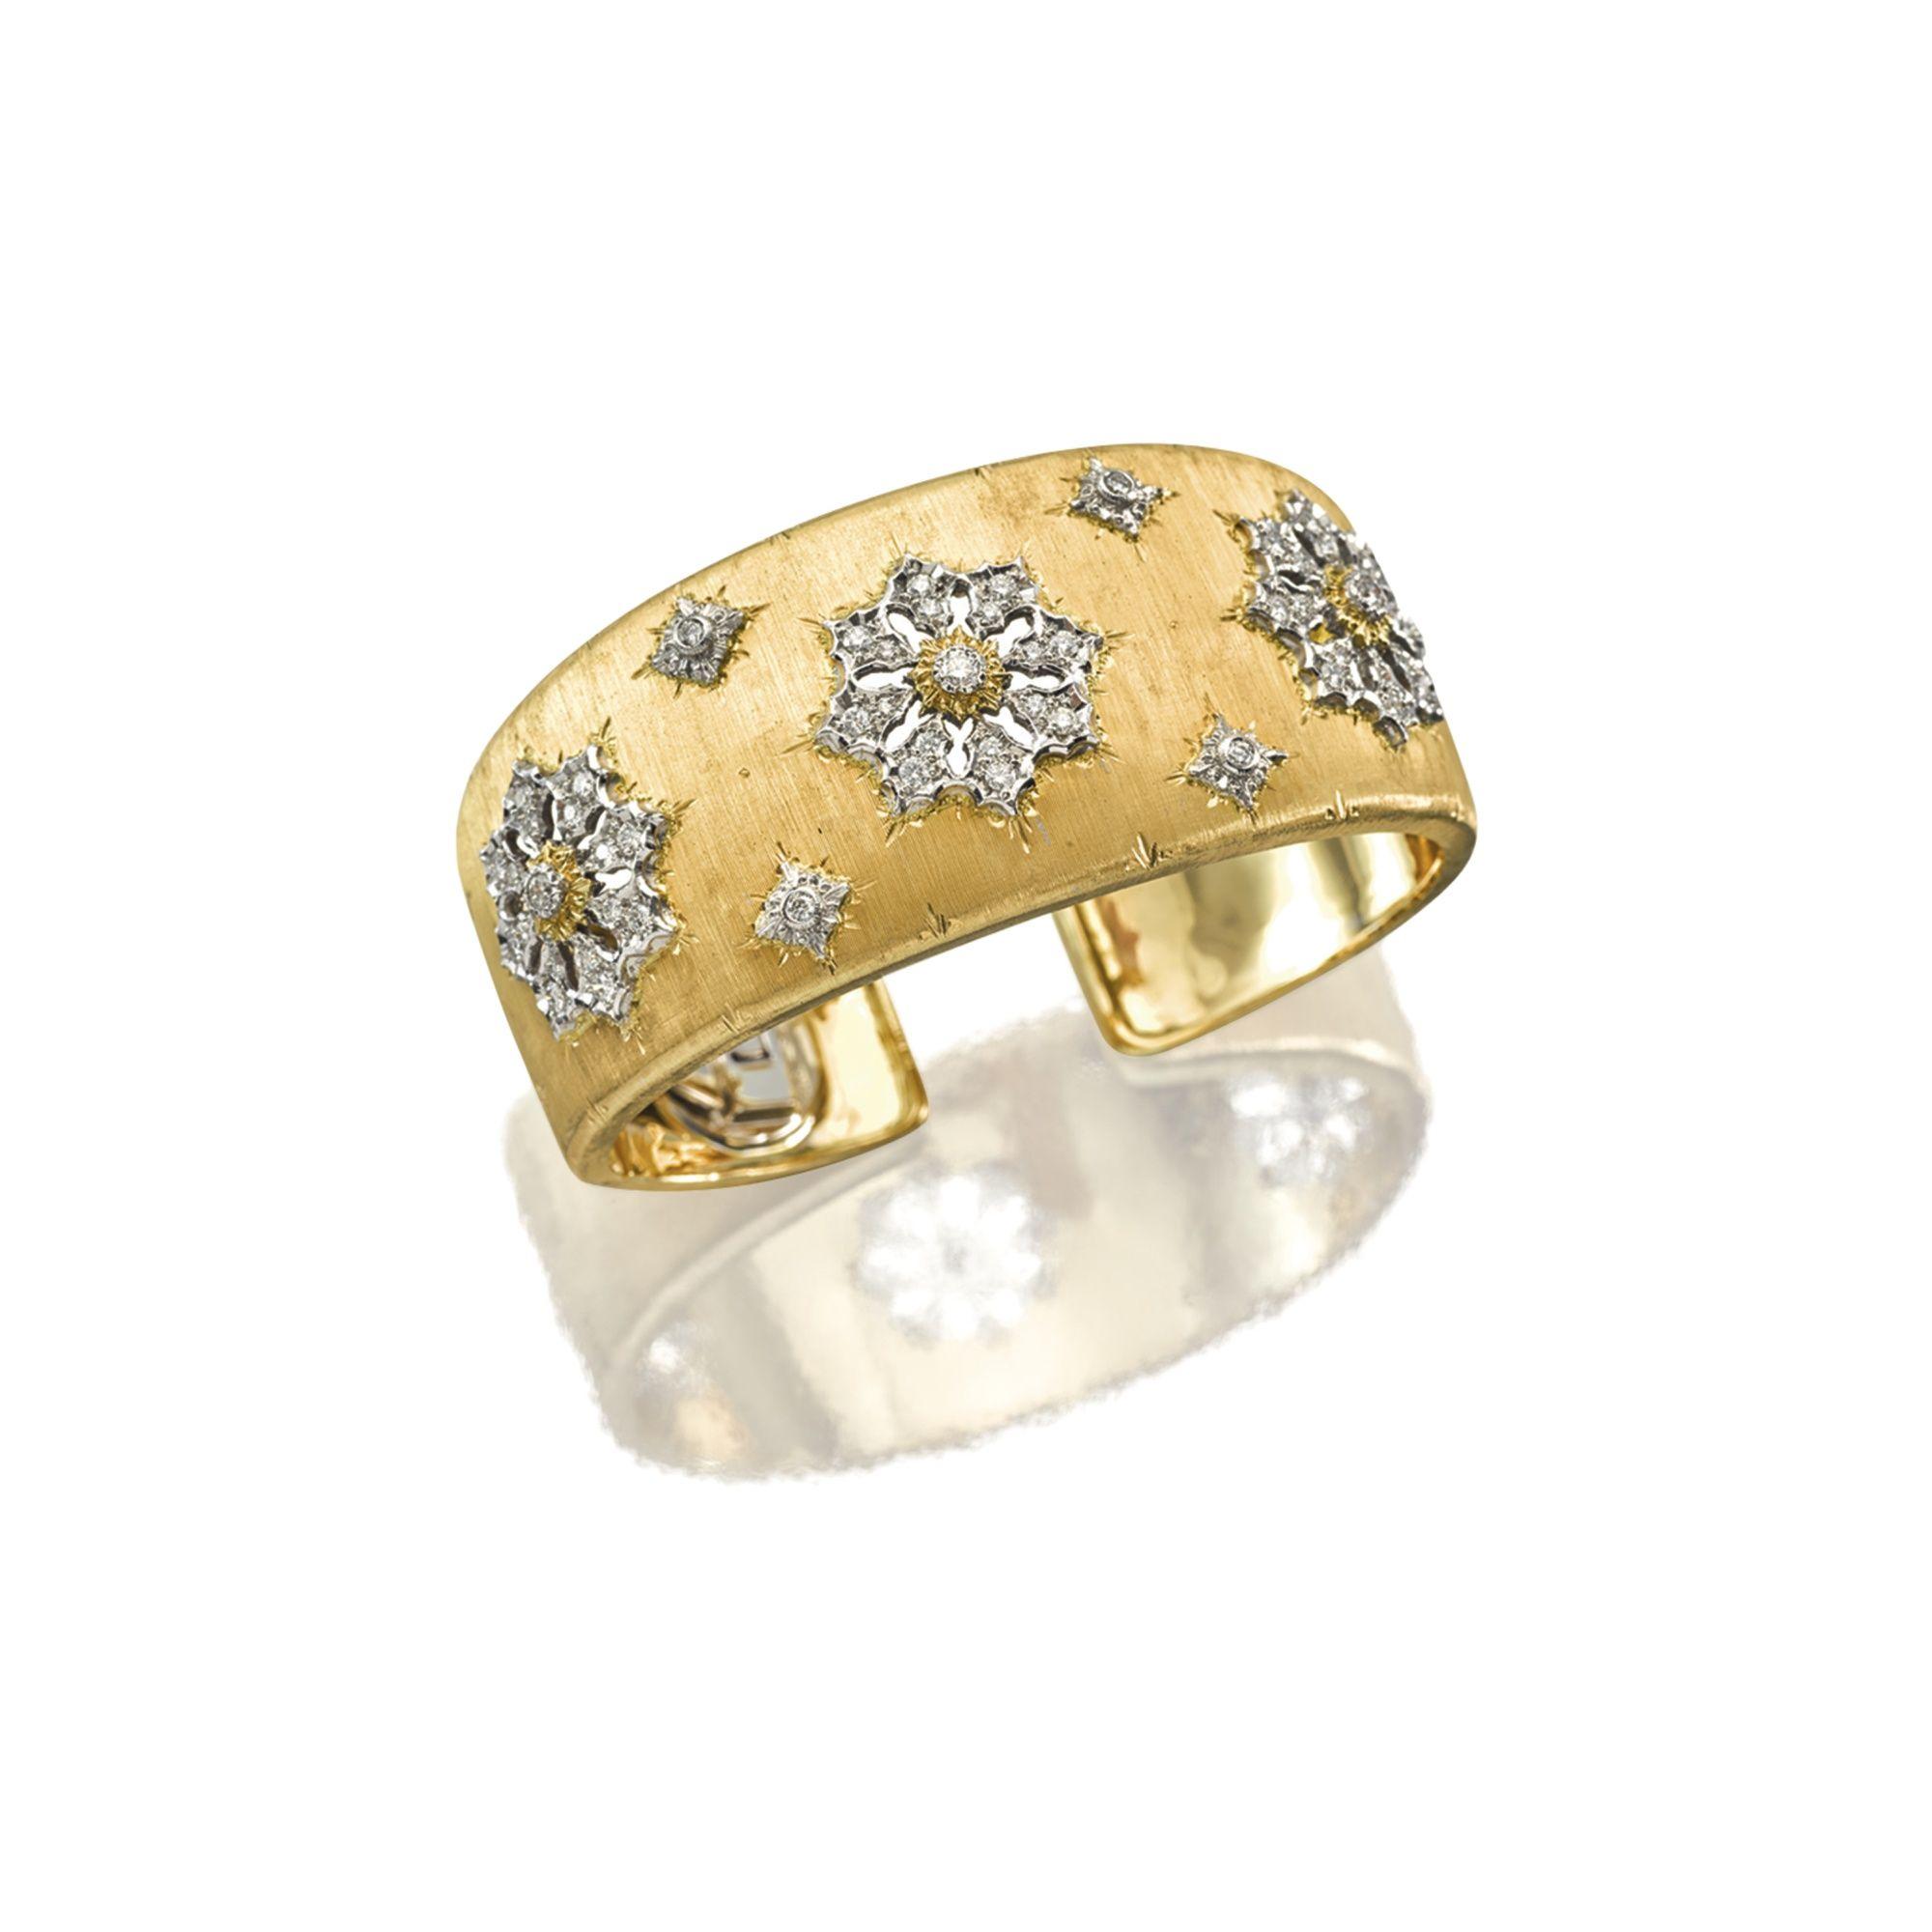 18 Karat Gold and Diamond Cuff Bangle Mario Buccellati The hinged